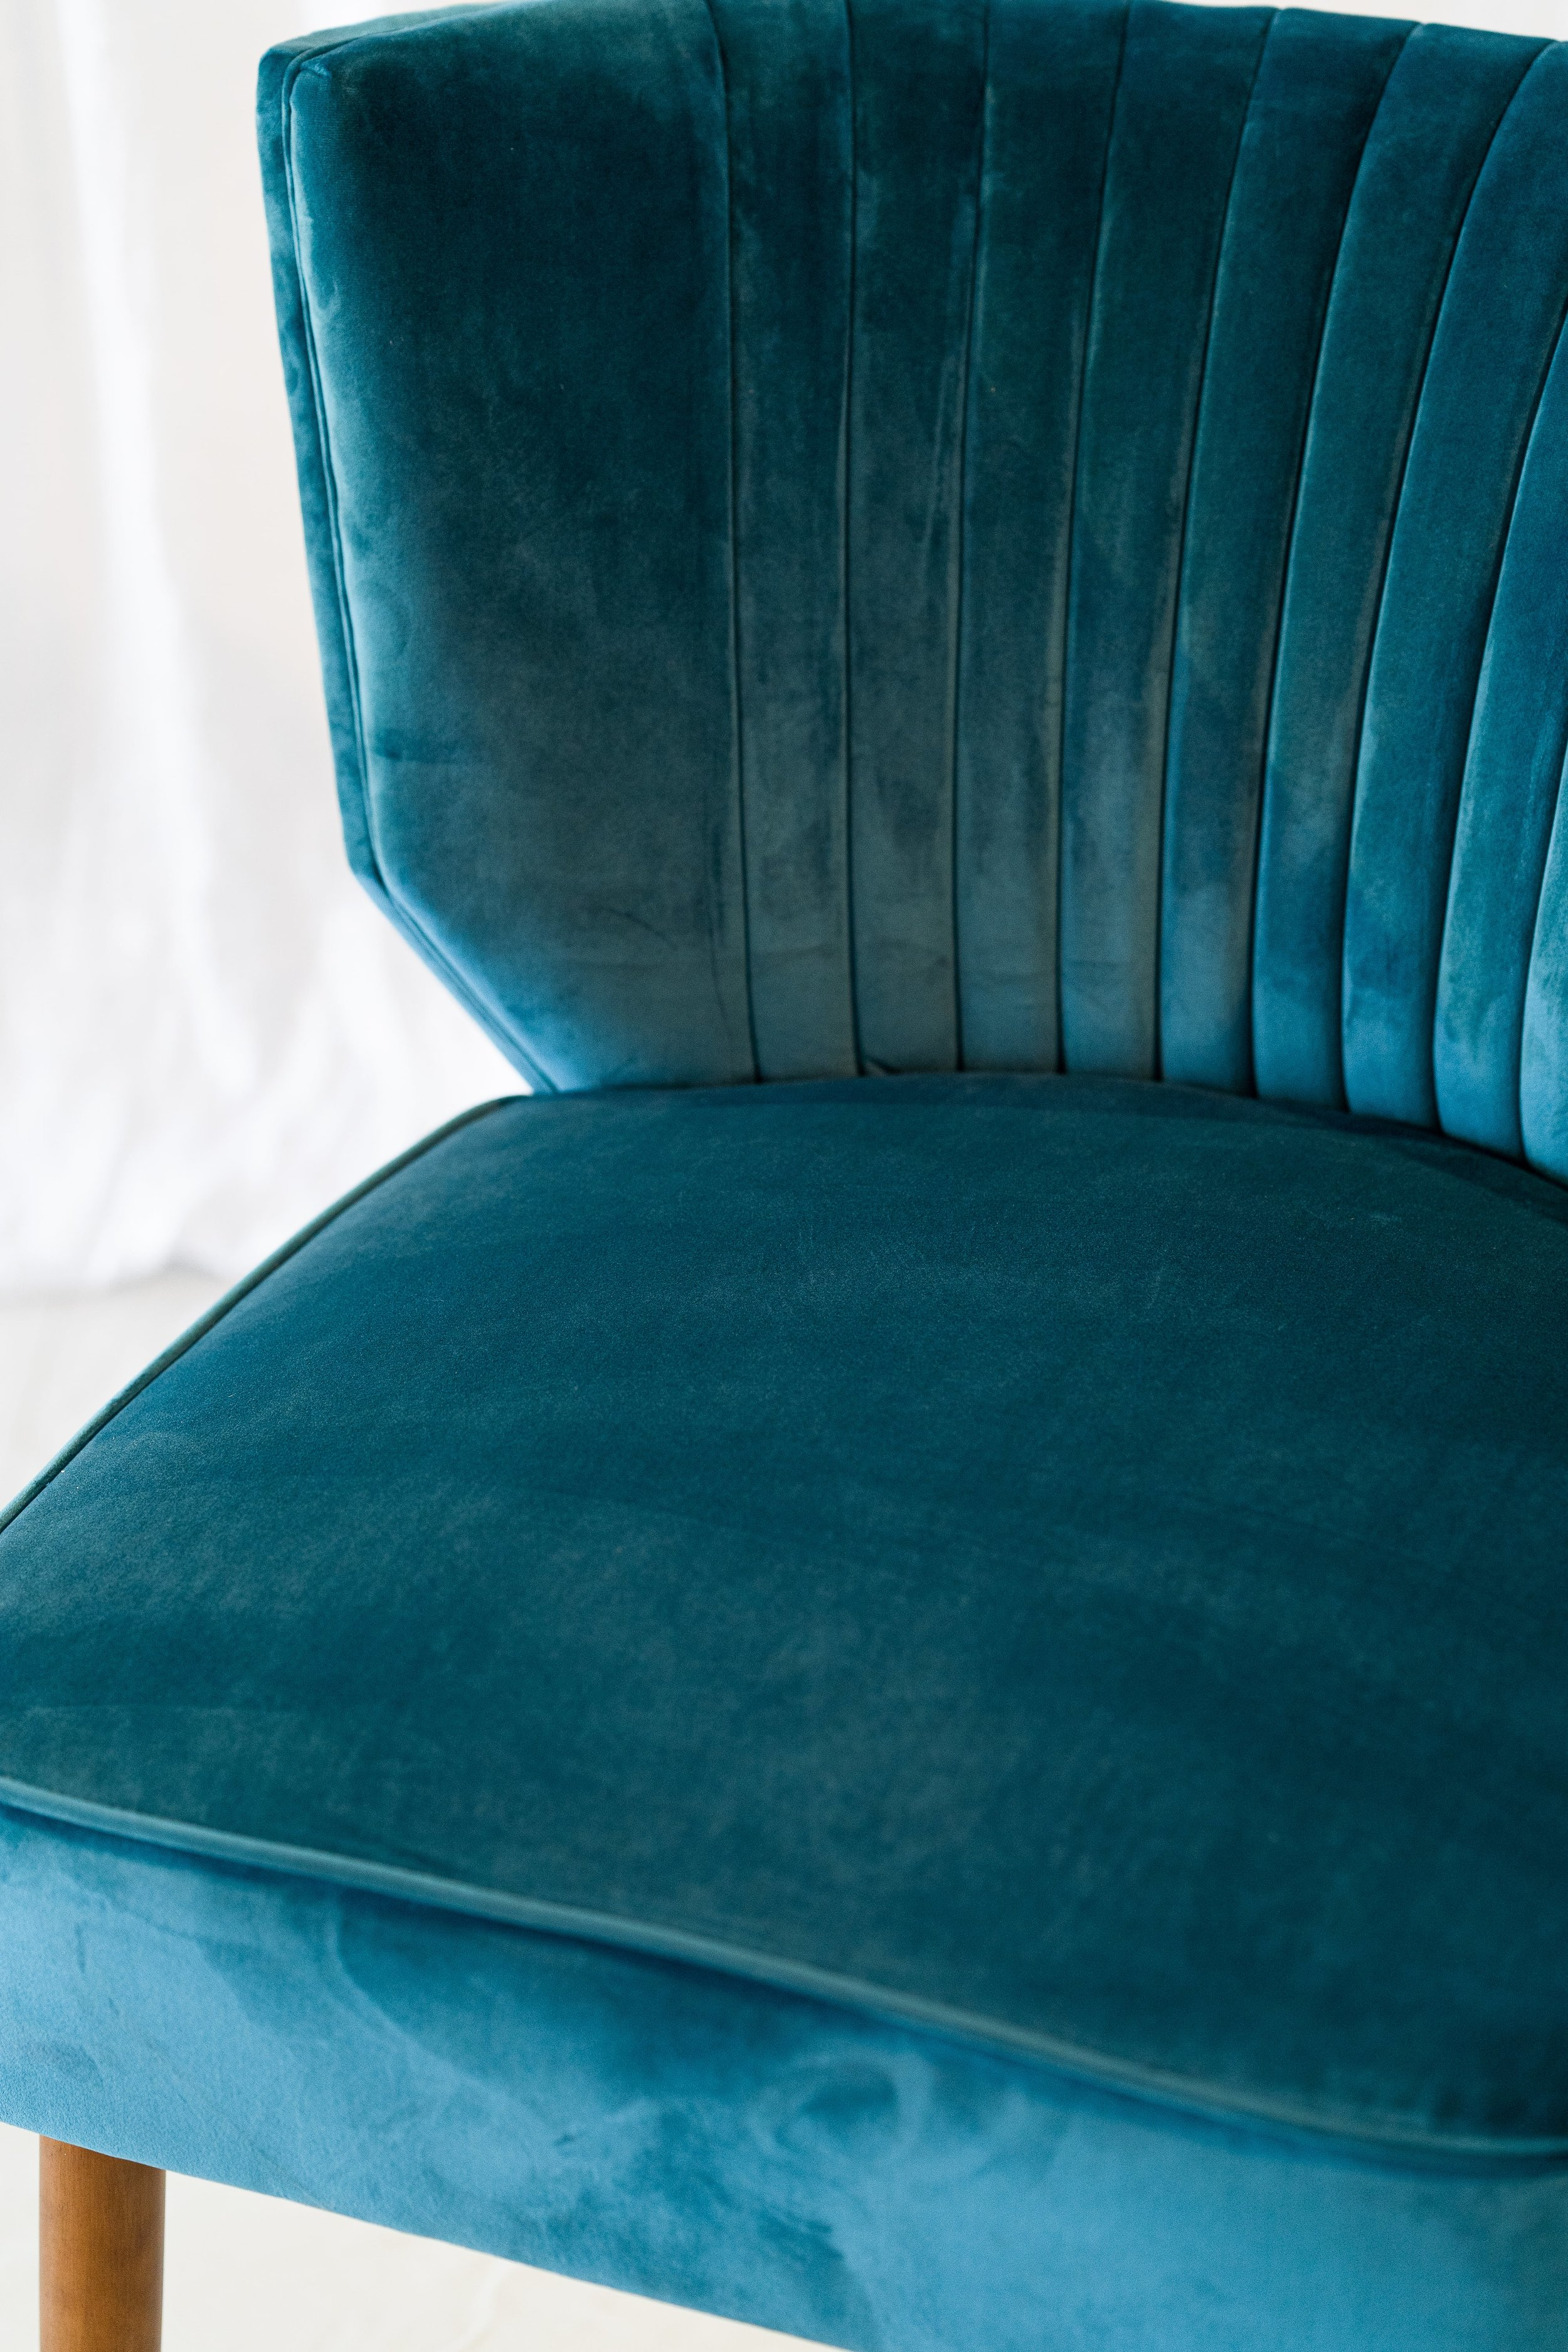 vintage chair images2-2-min.jpg